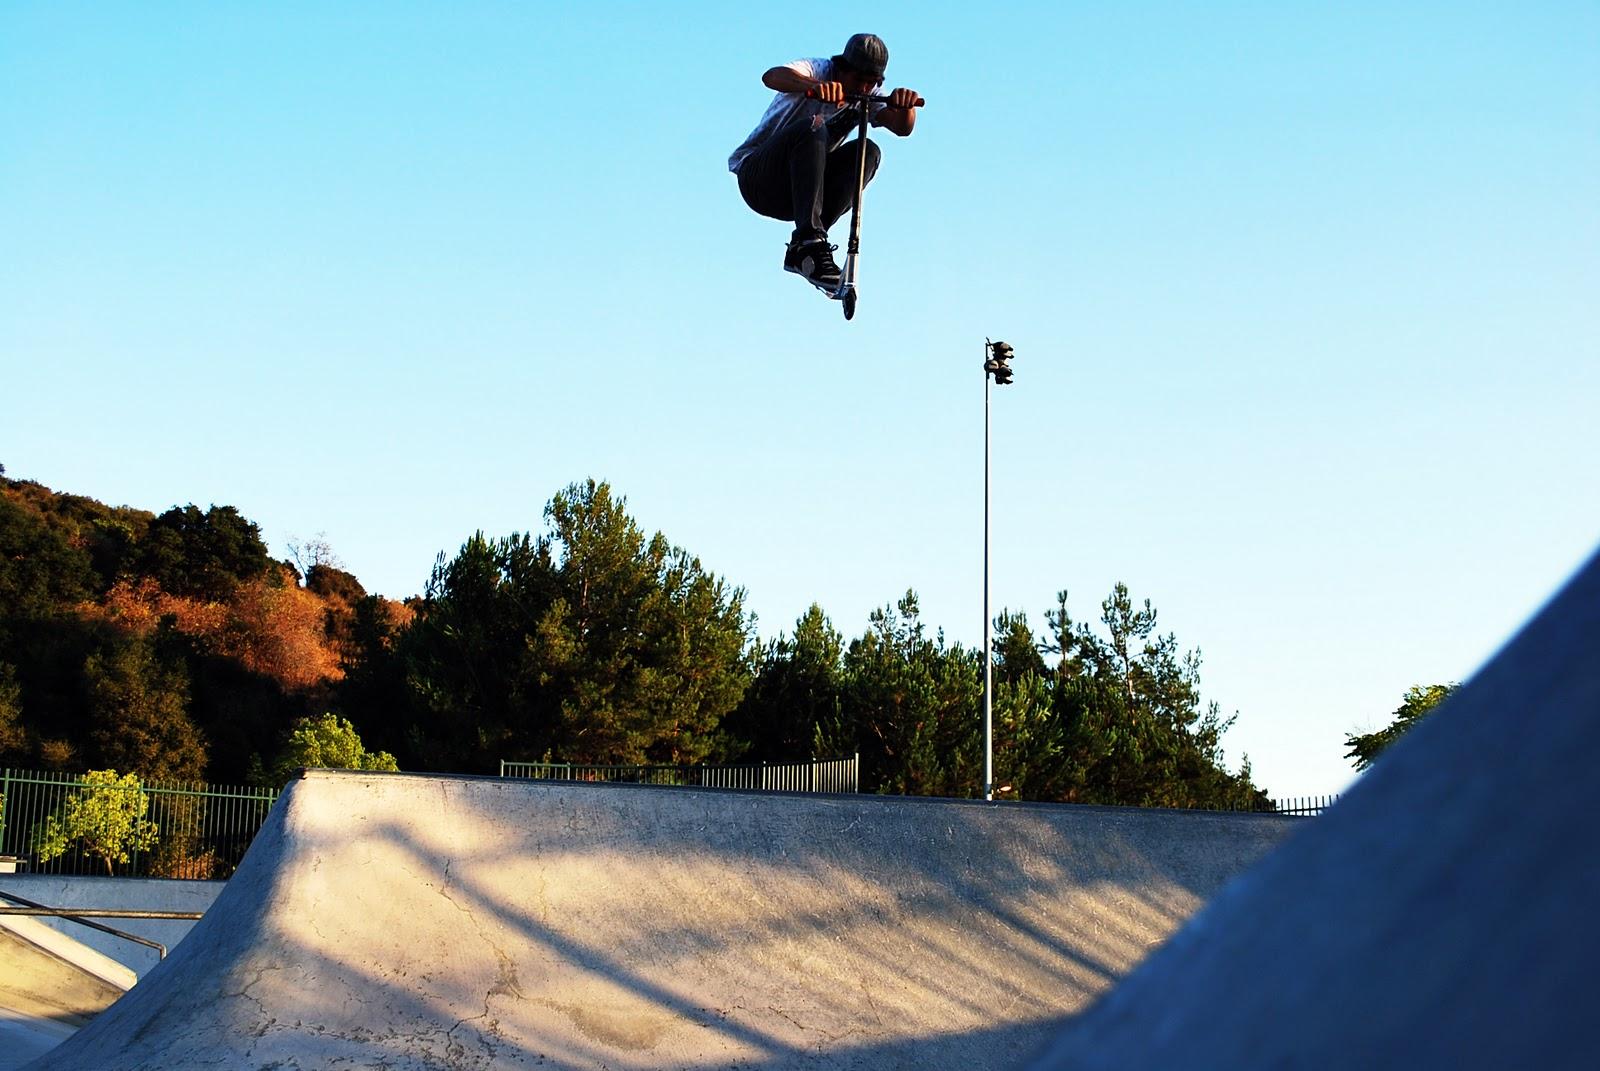 Un trotirdier en plein trick au skatepark